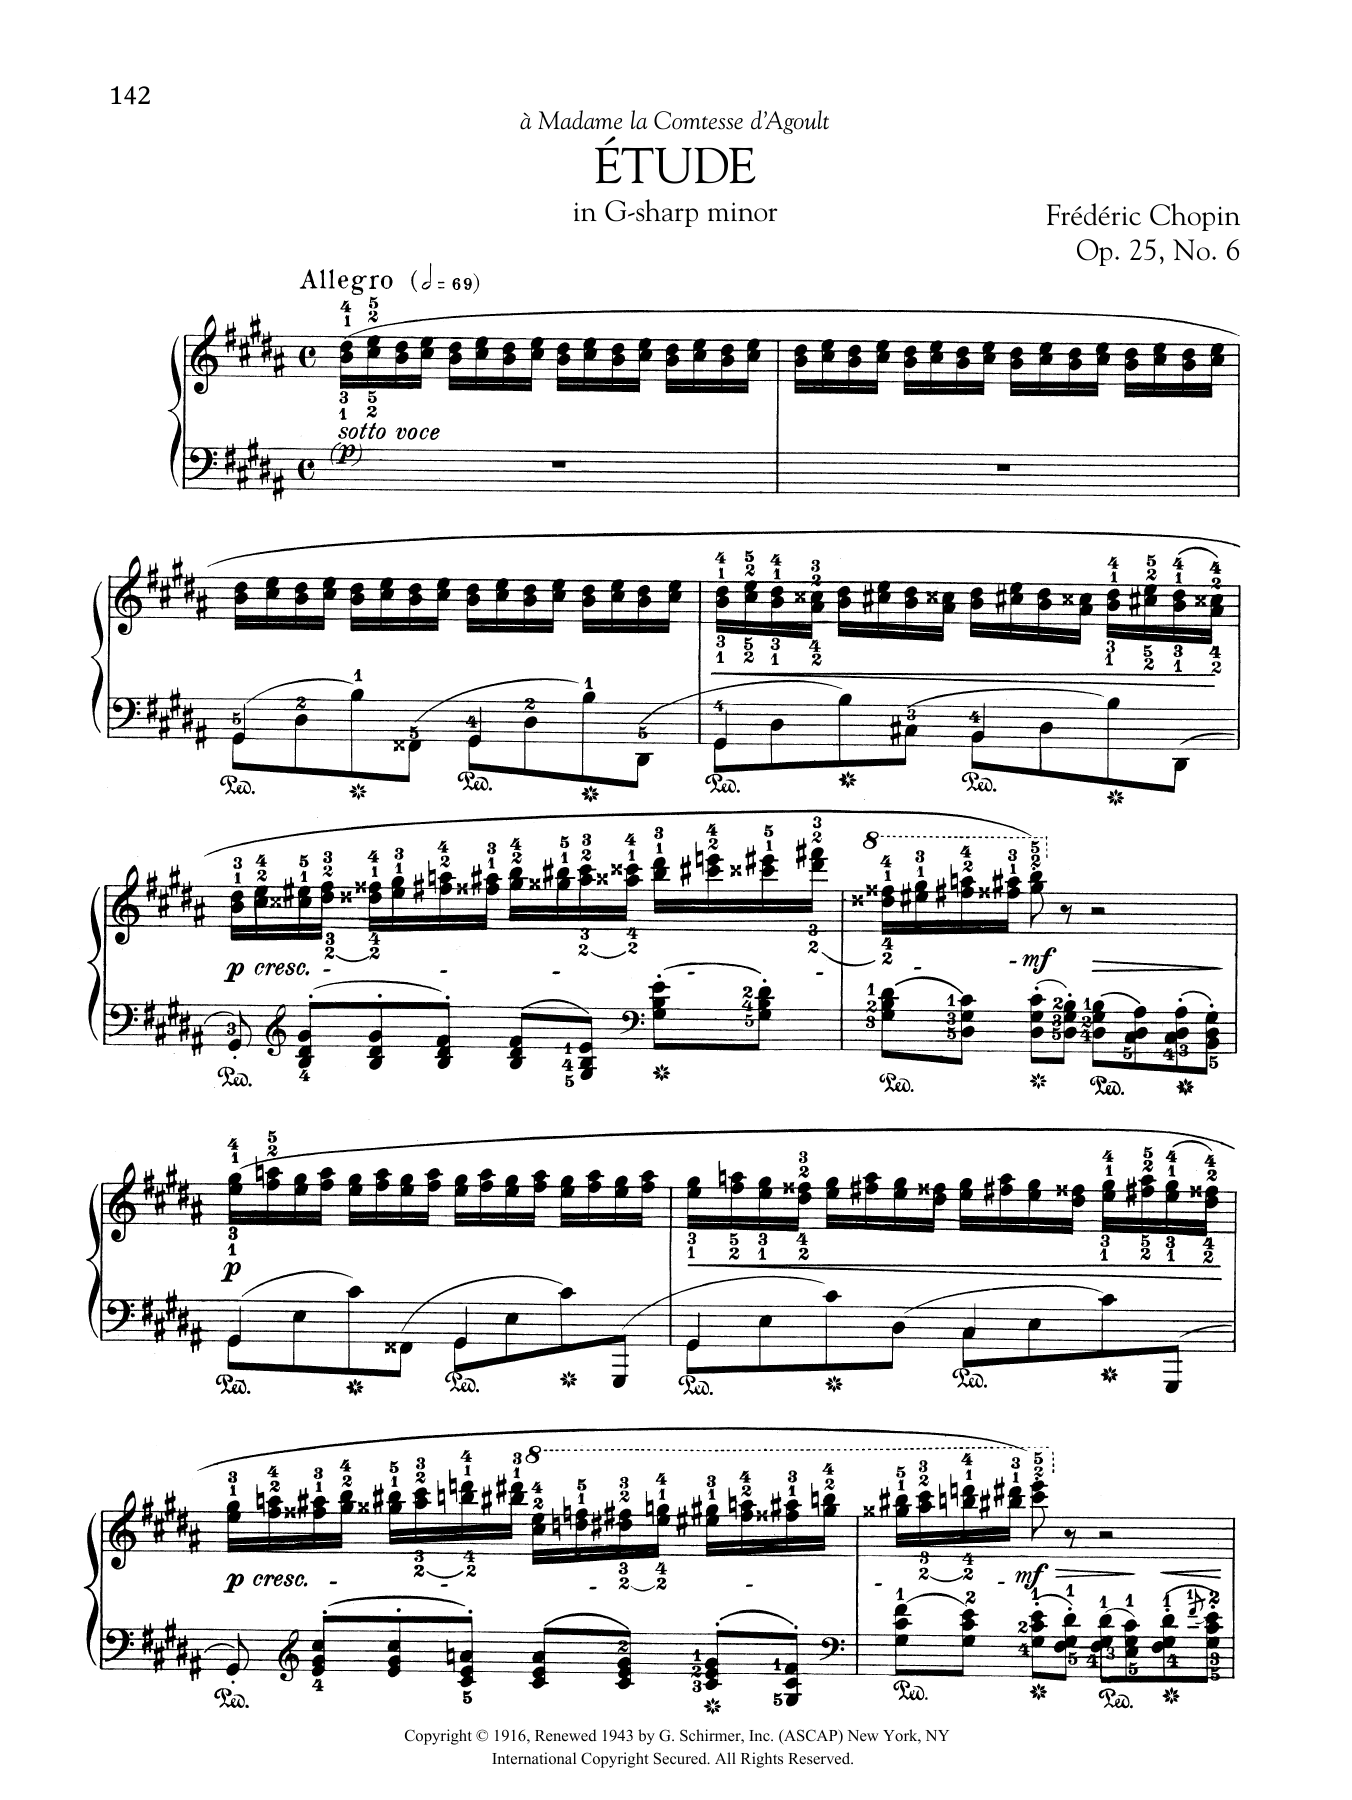 Etude in G-sharp minor, Op  25, No  6 by Frederic Chopin Piano Solo Digital  Sheet Music